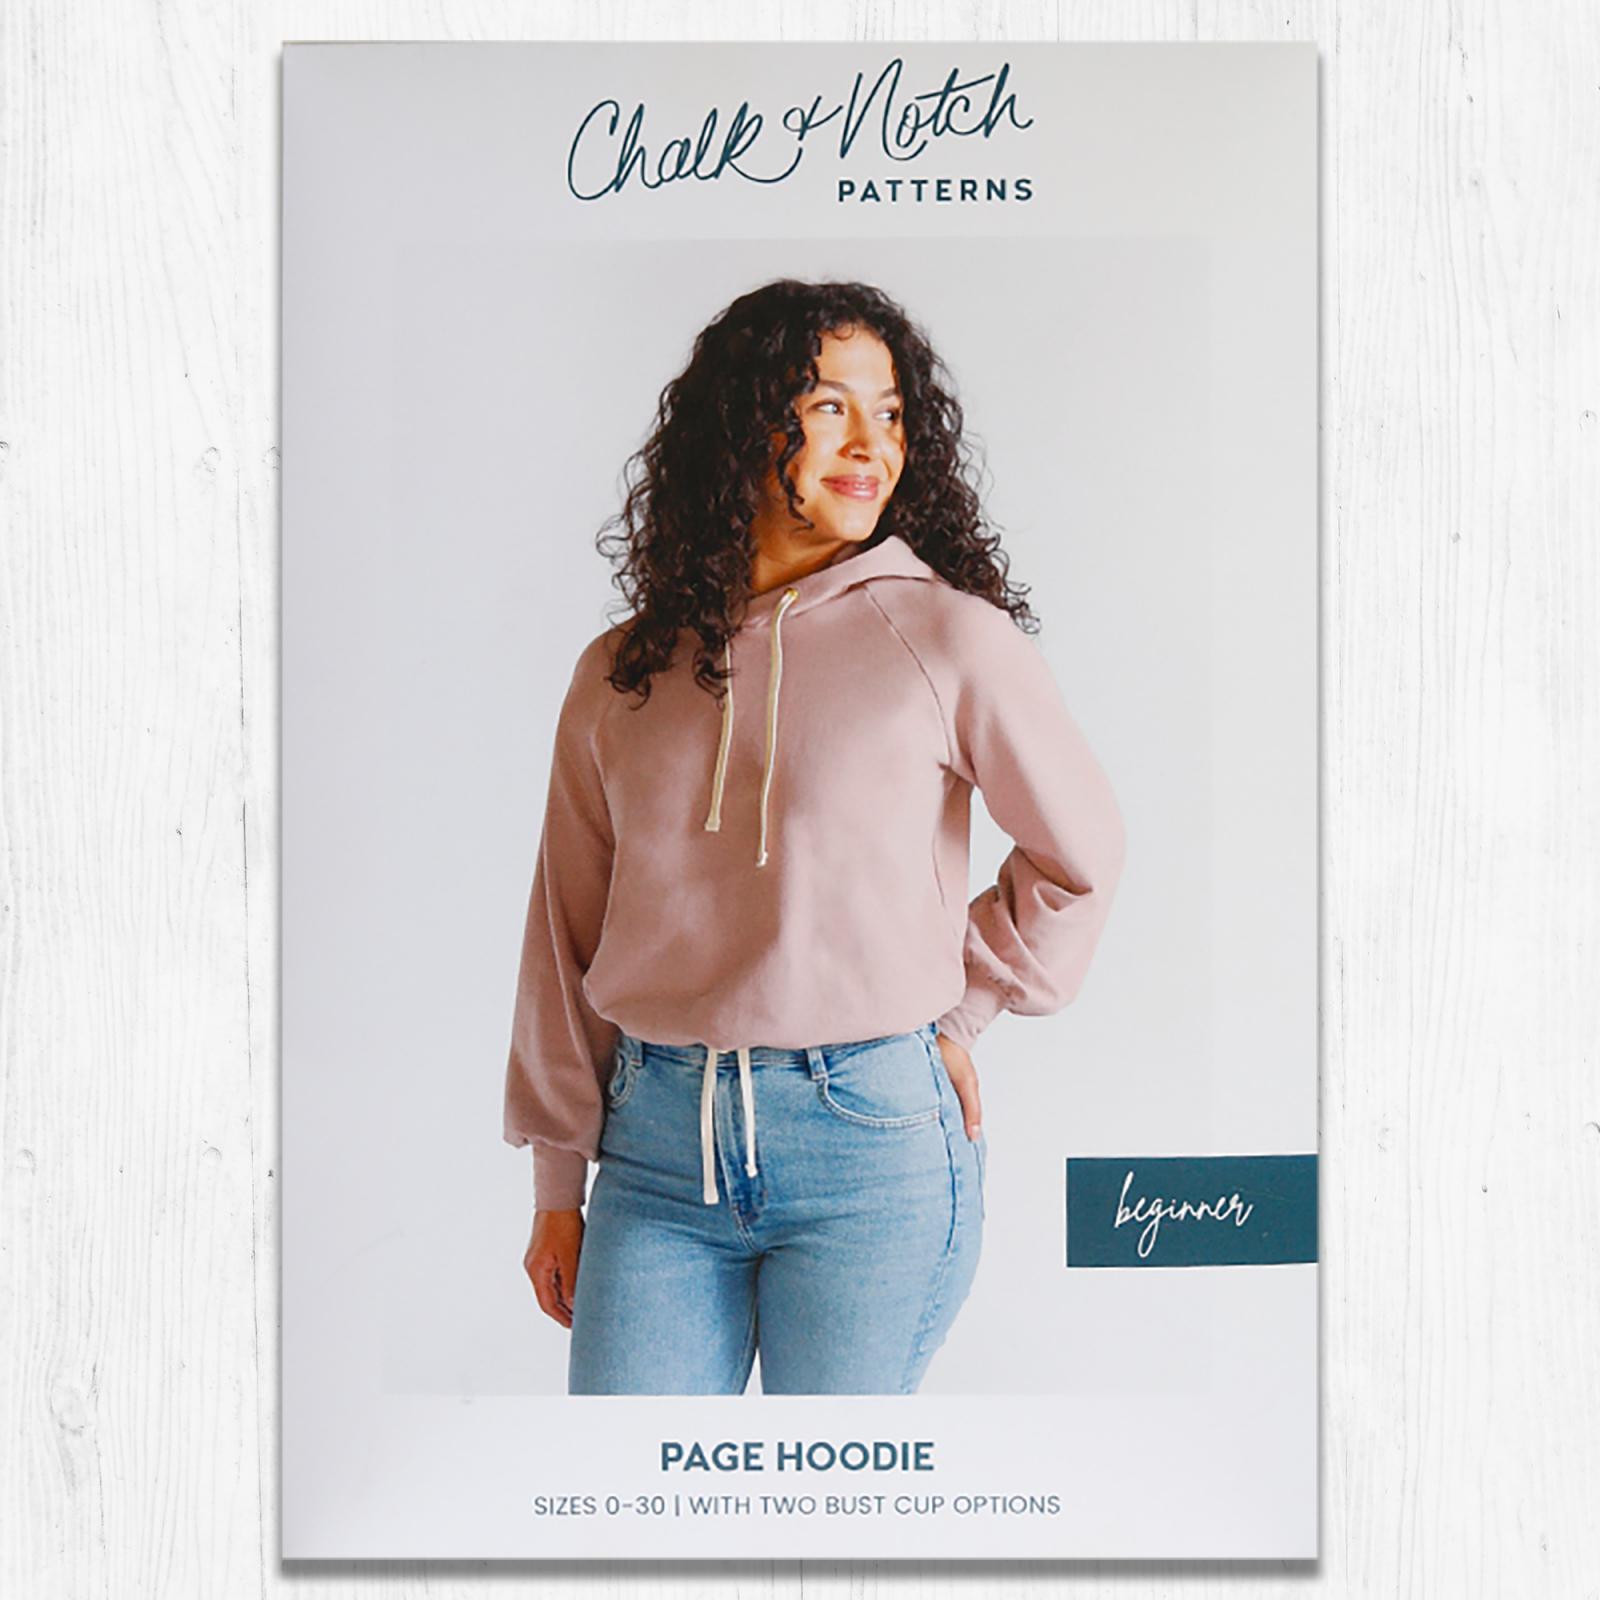 Chalk & Notch - Page Hoodie